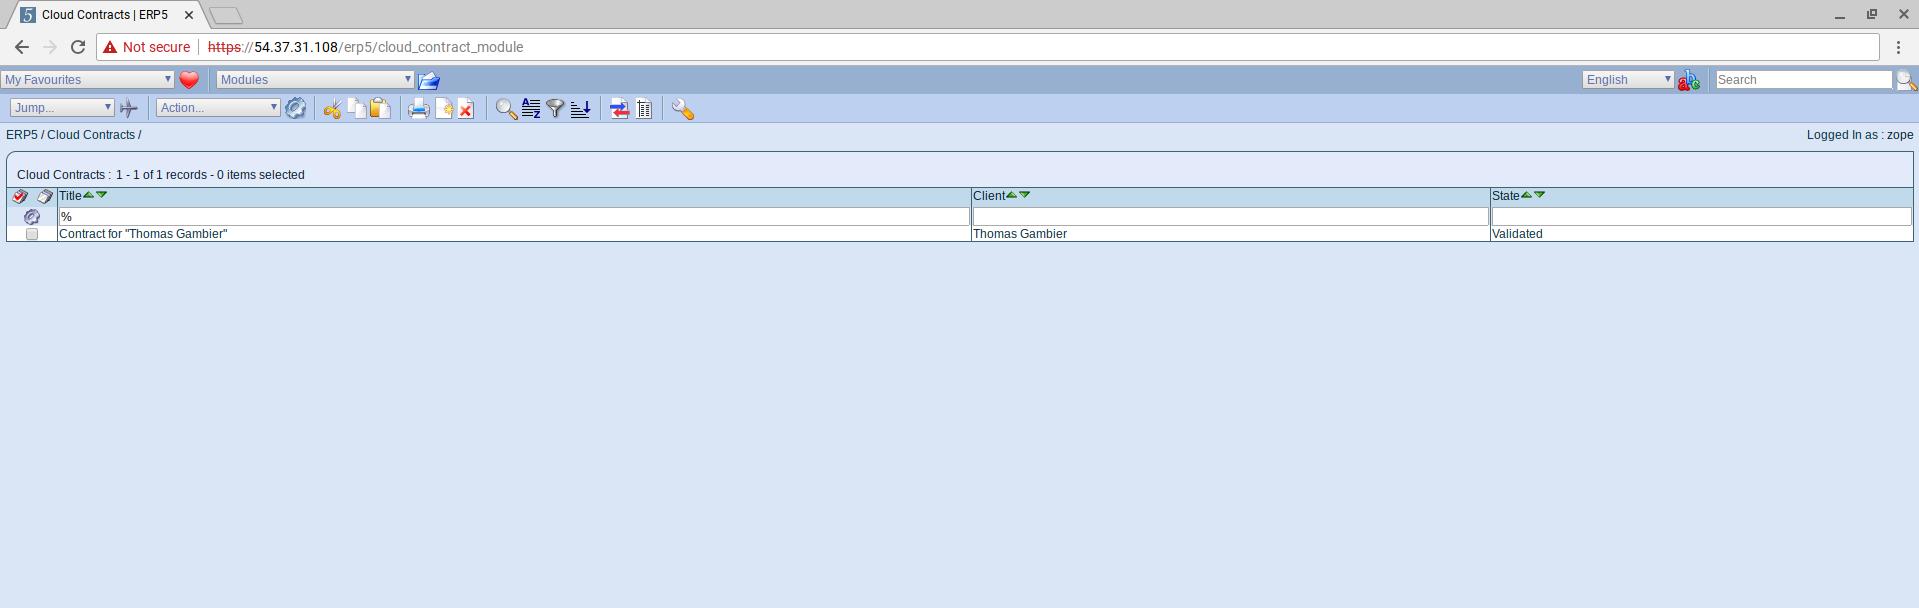 SlapOS Interface - Cloud Contract Module